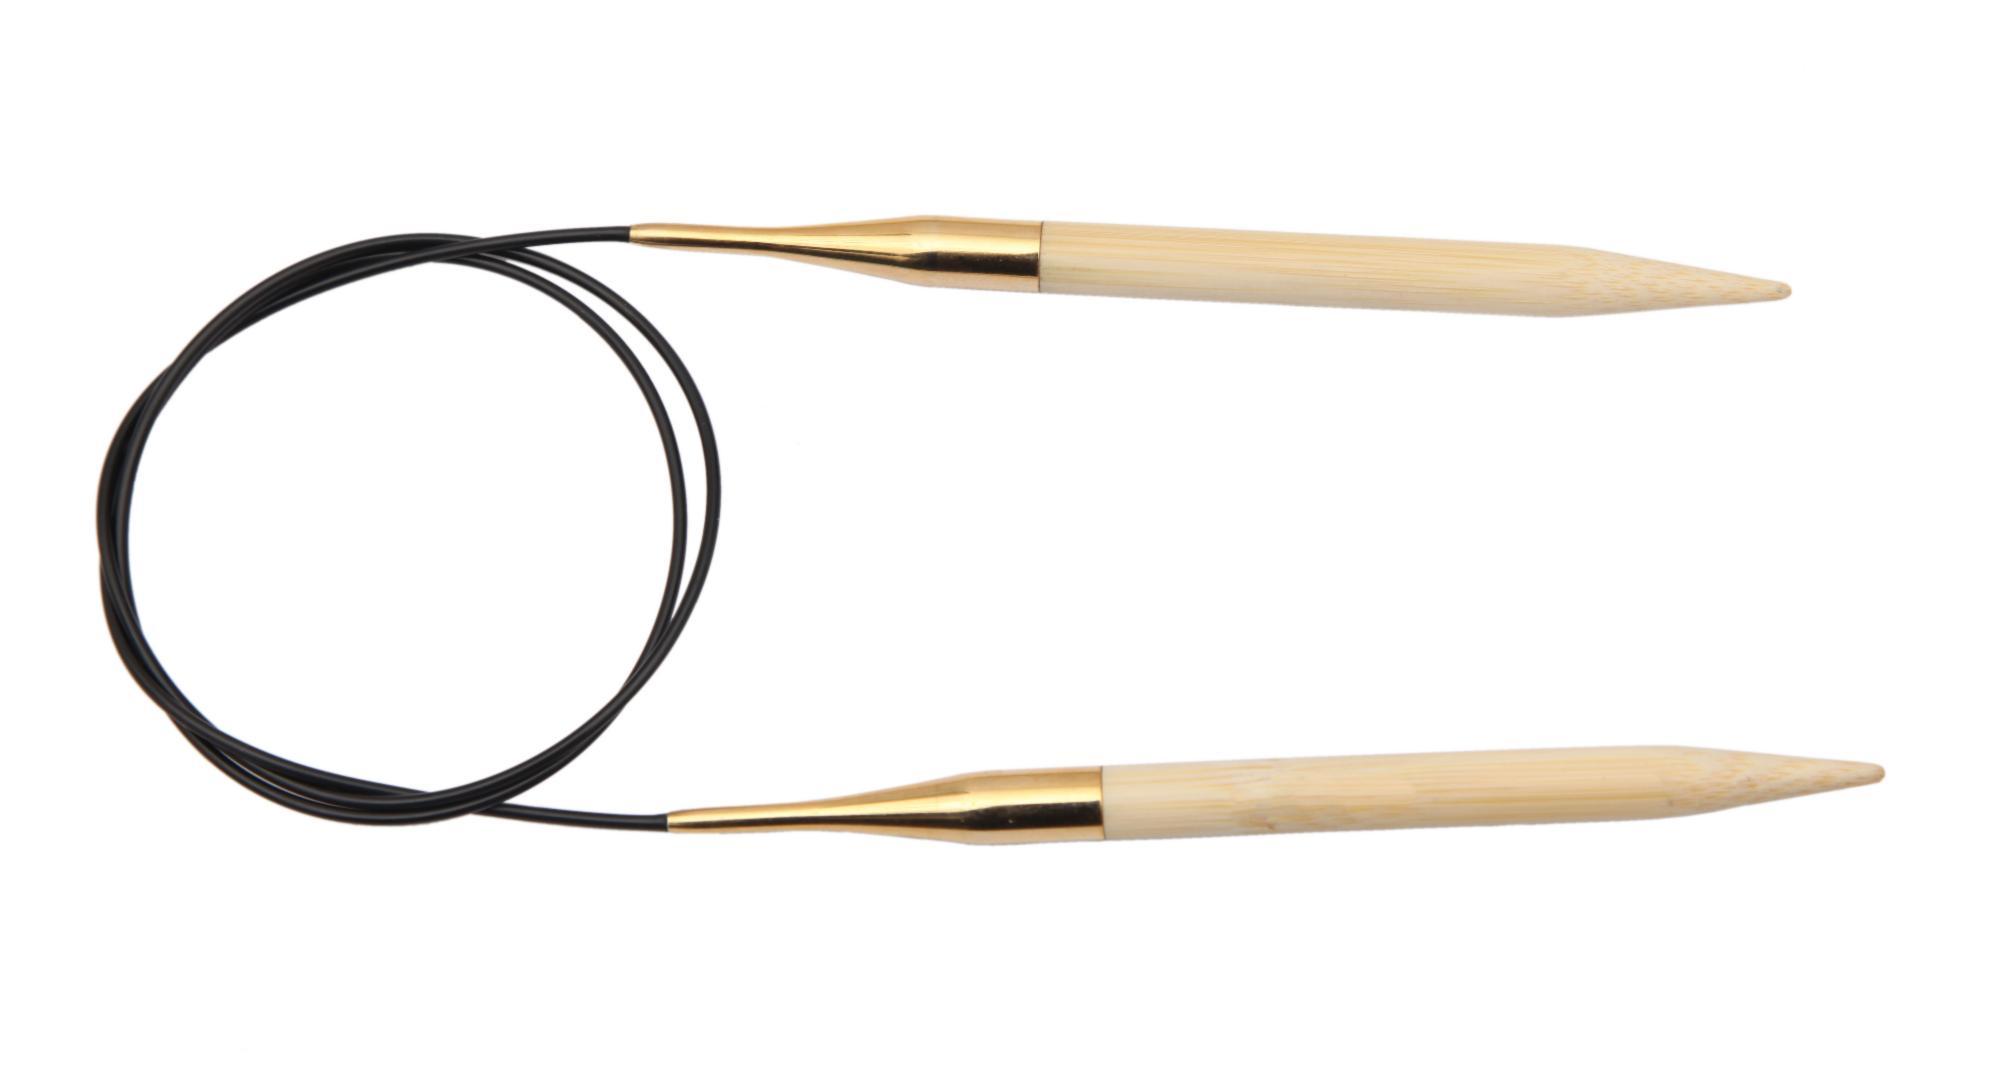 Спицы круговые 60 см Bamboo KnitPro, 22222, 2.25 мм